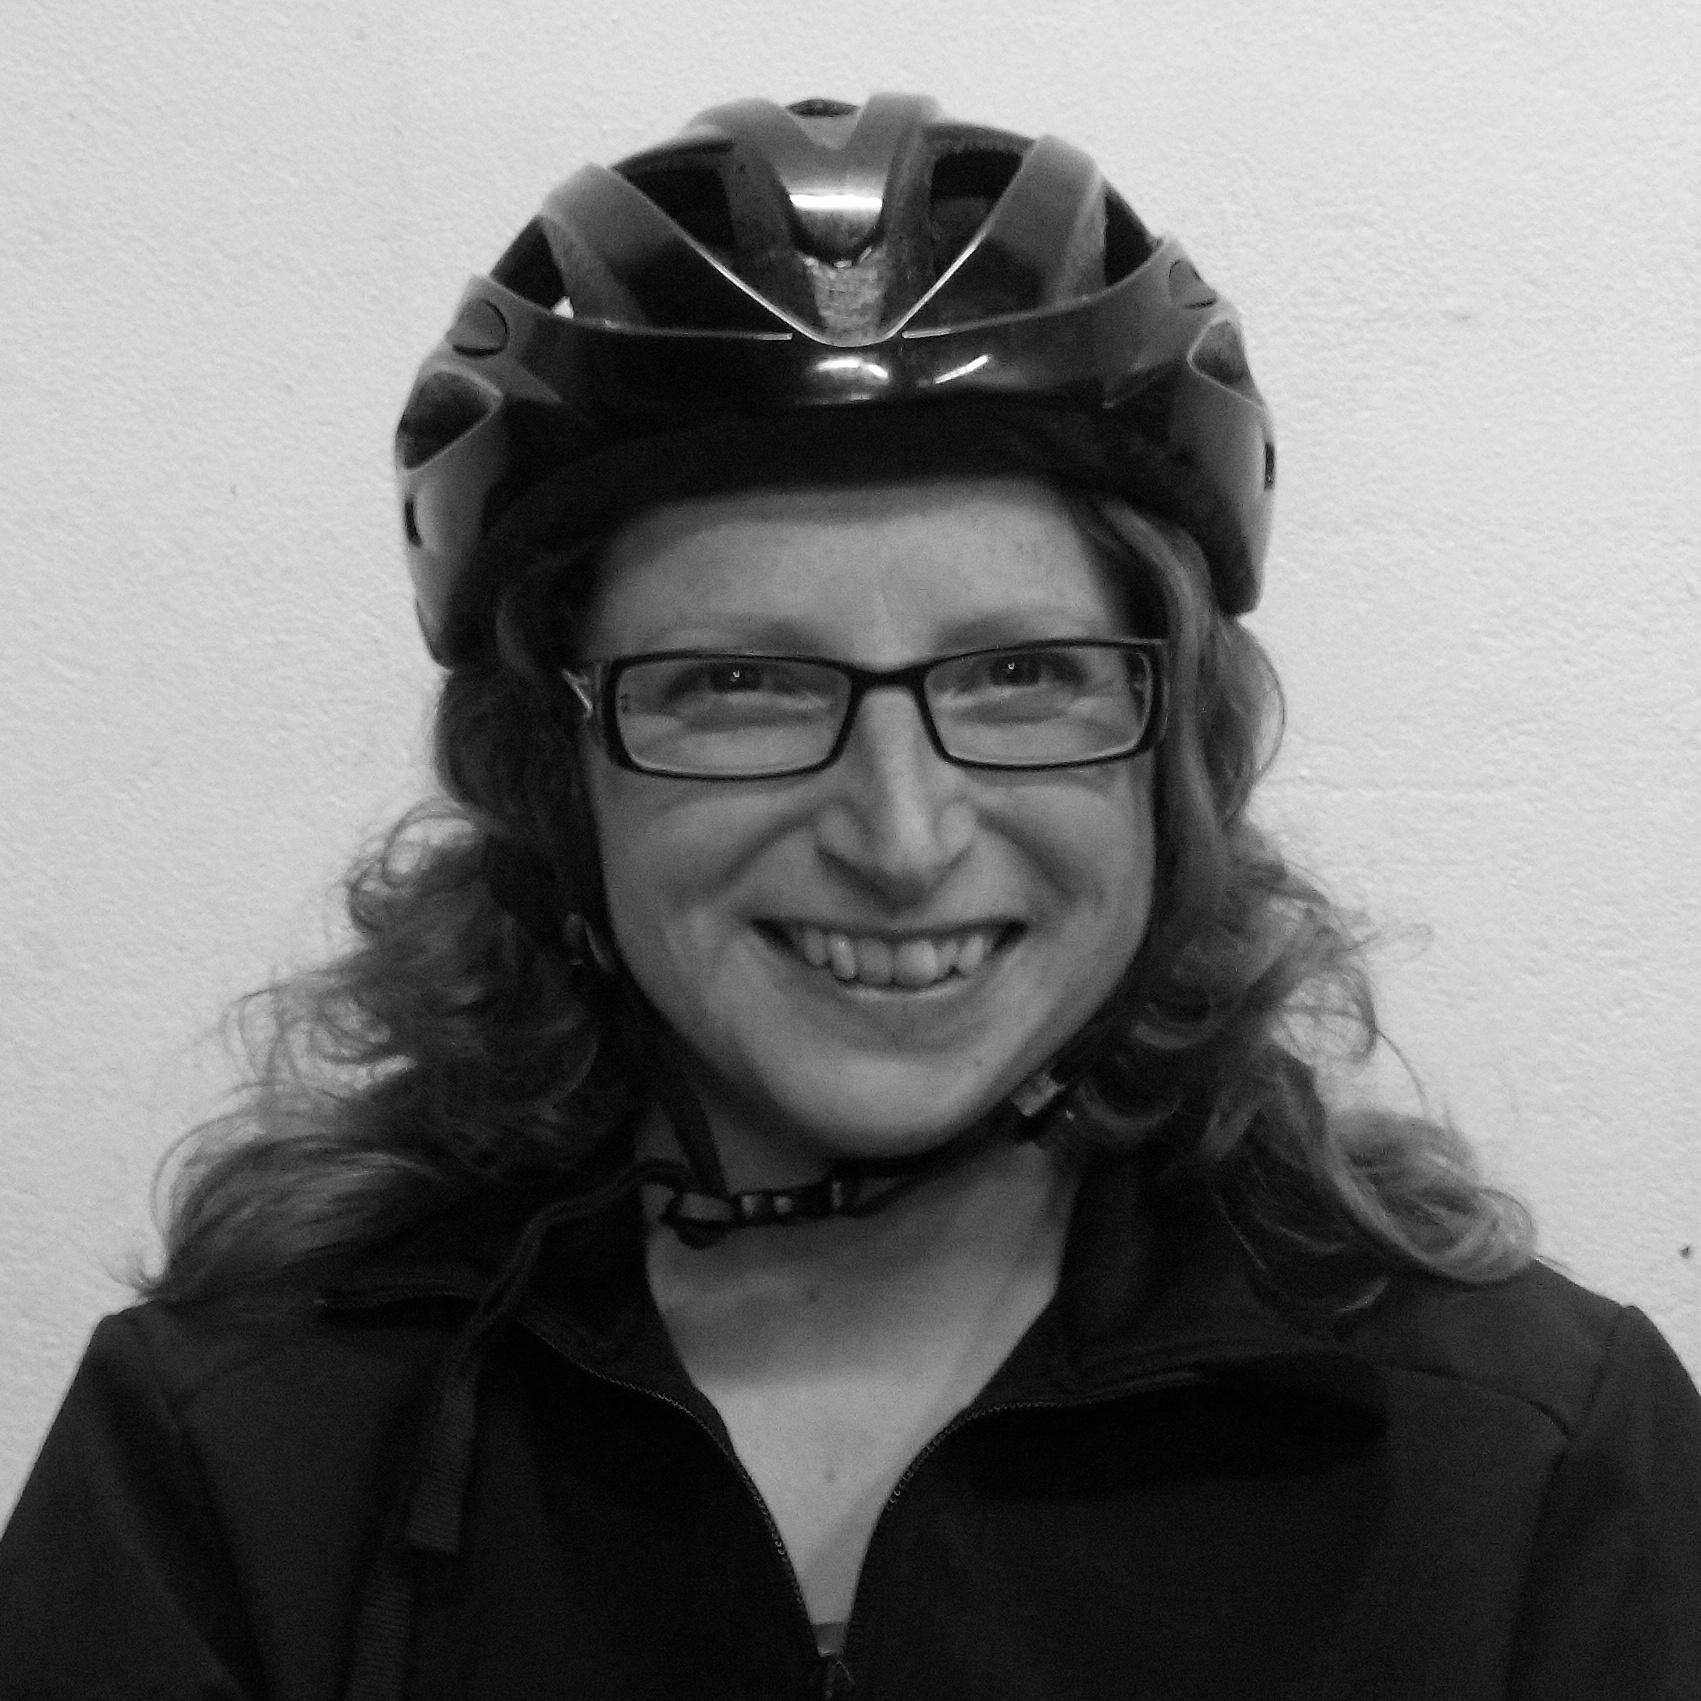 portretfoto fietskoerier esther terpstra